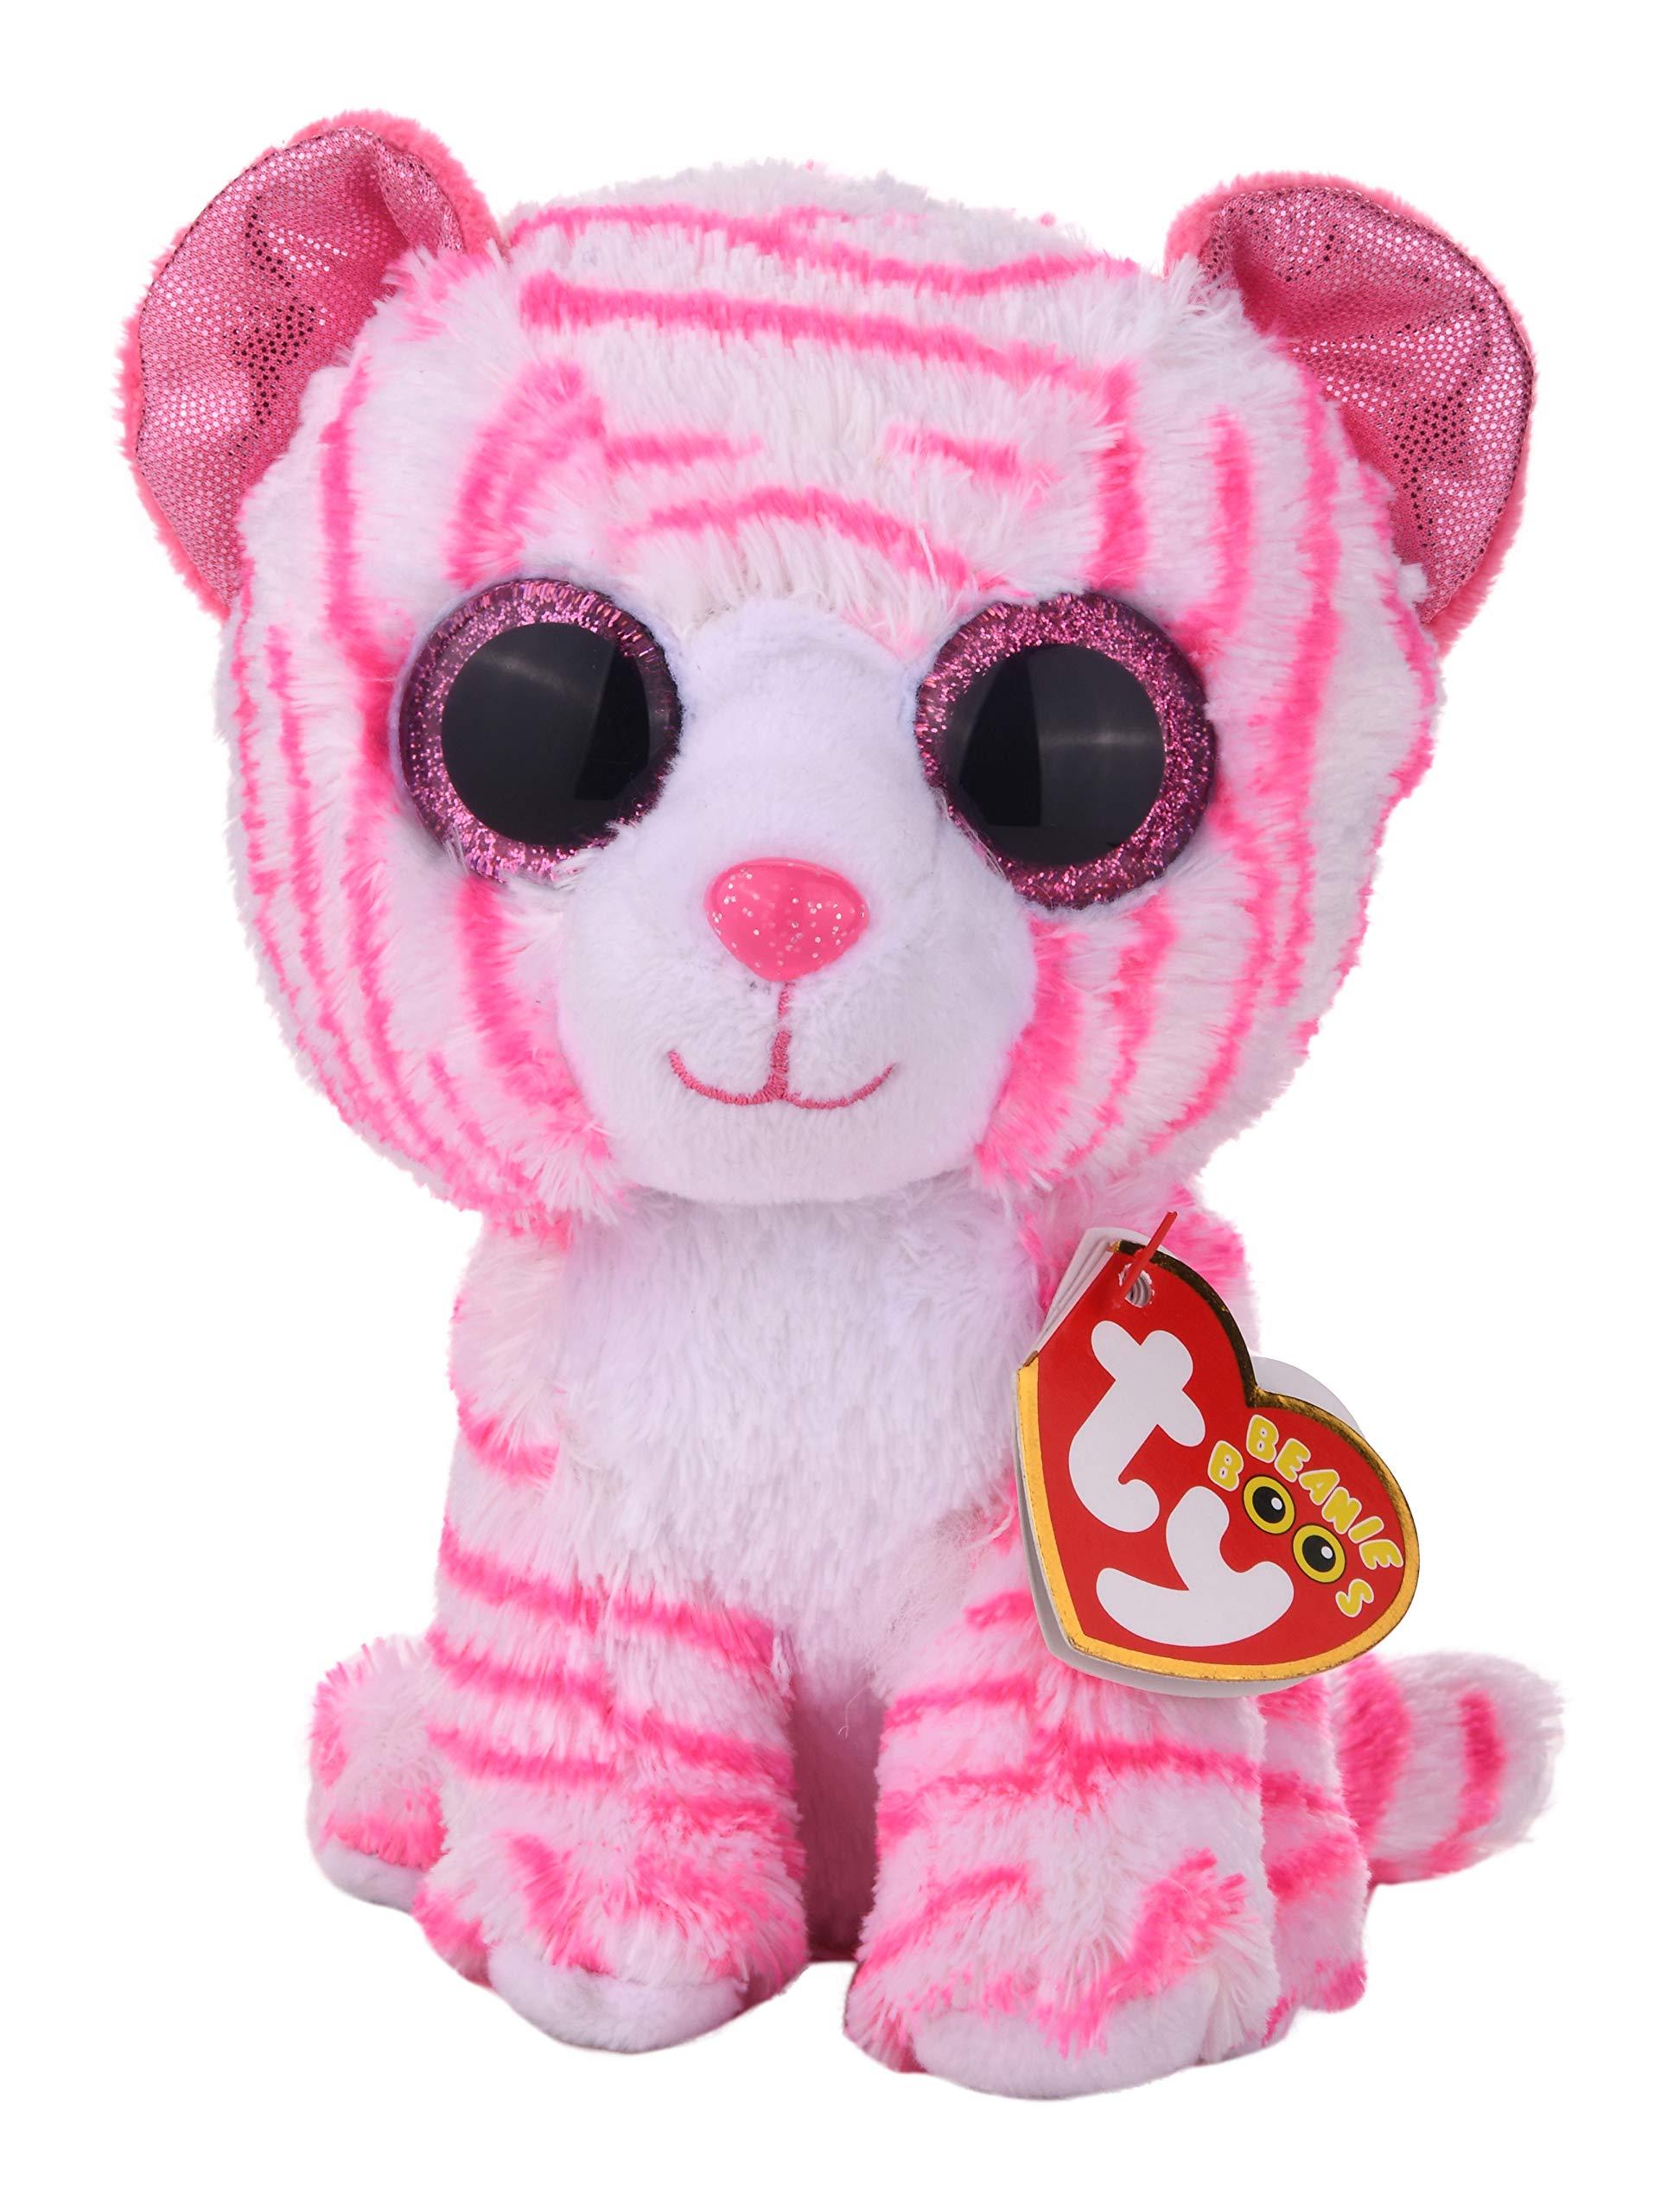 TY Beanie Boo Plush - Asia the Tiger 15cm